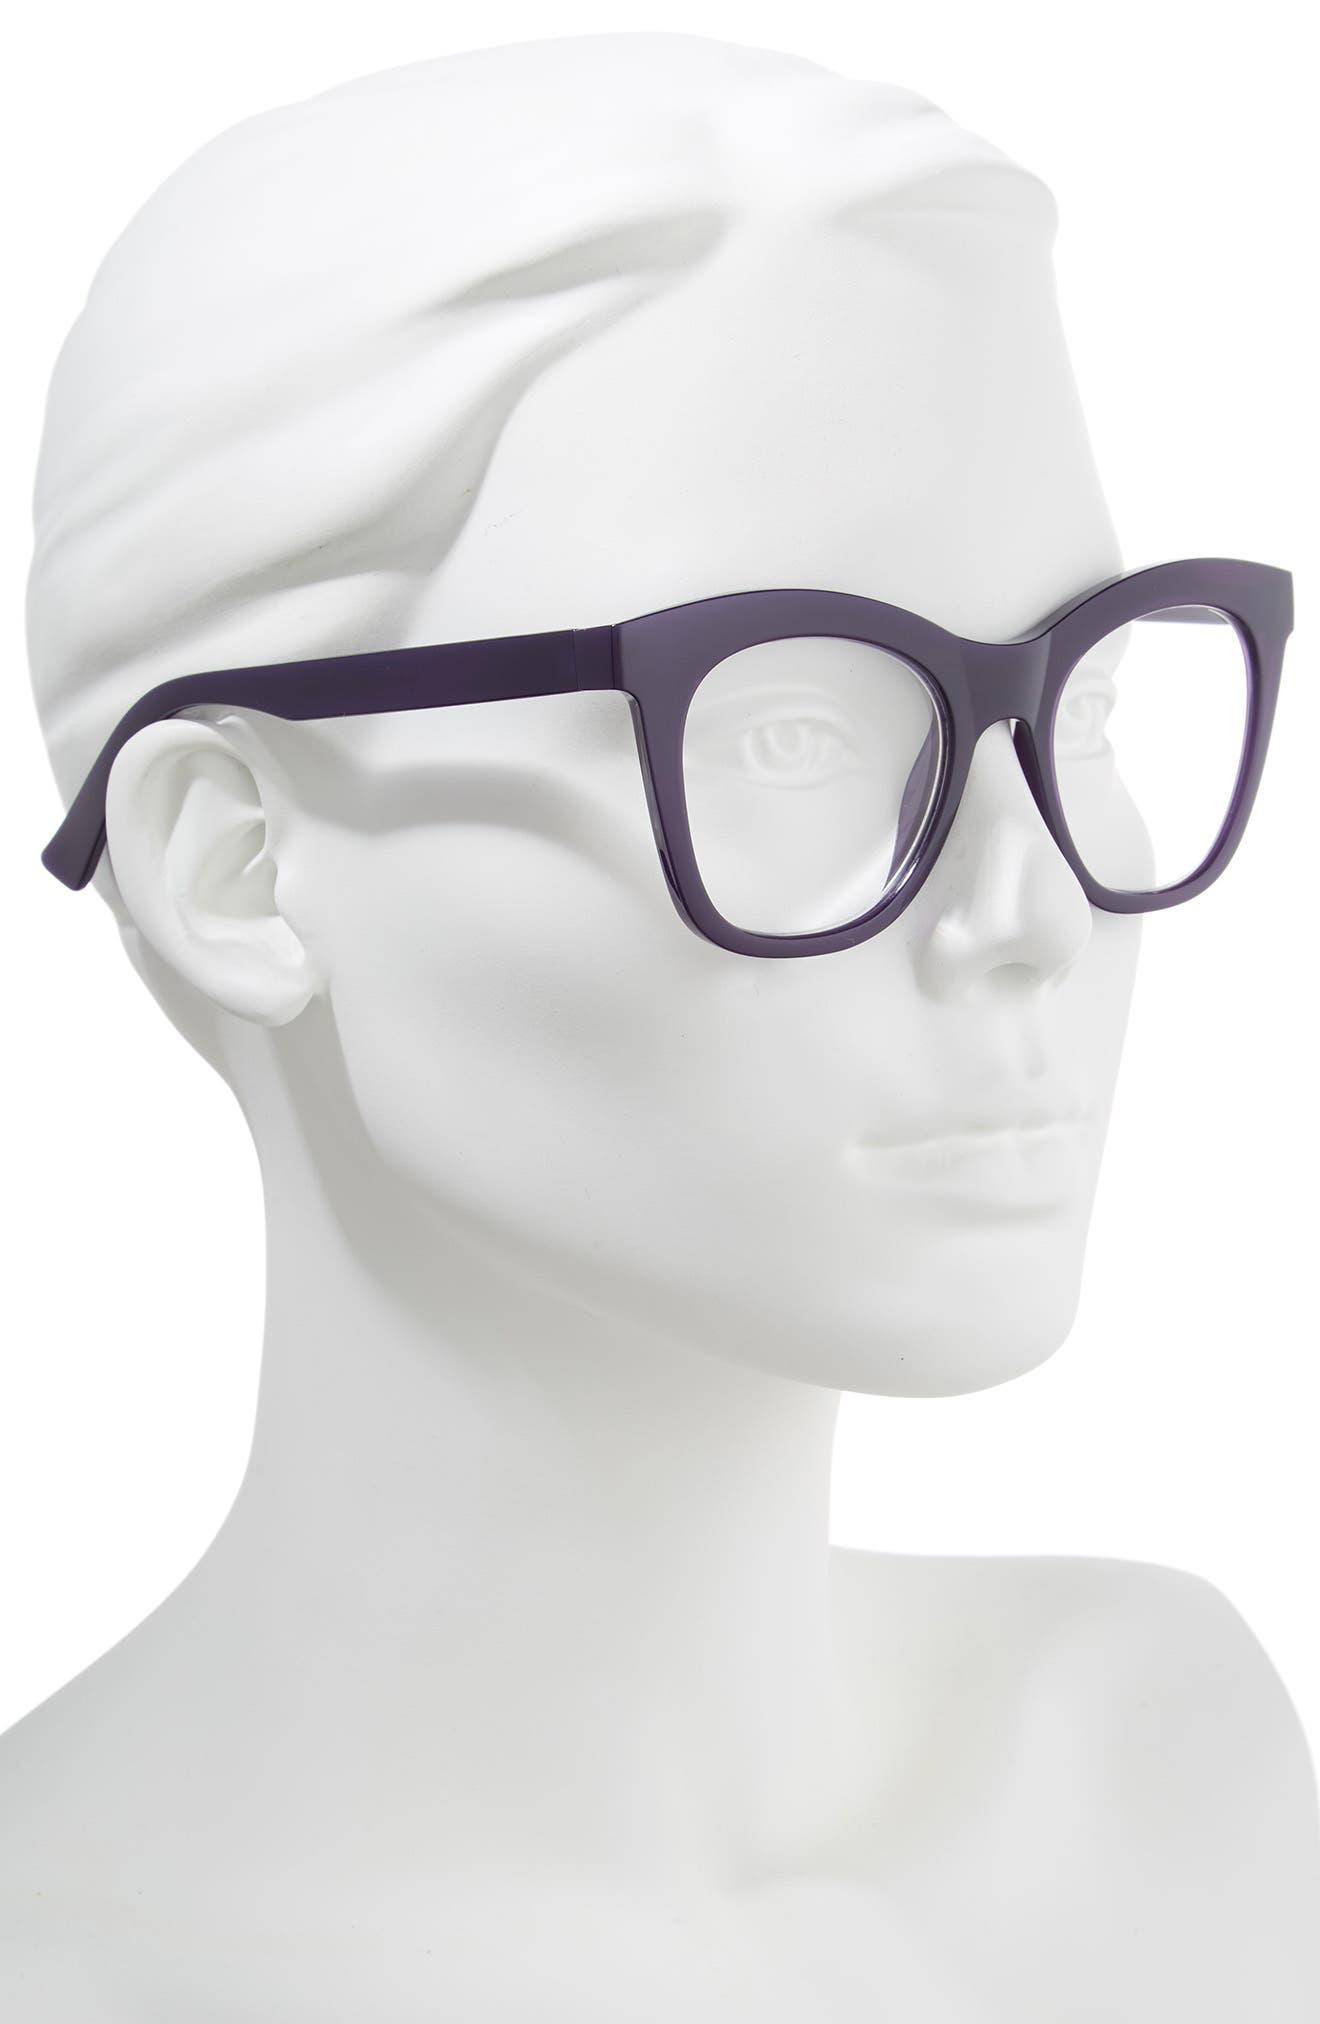 Harlot's Bed 51mm Reading Glasses,                             Alternate thumbnail 2, color,                             Deep Purple